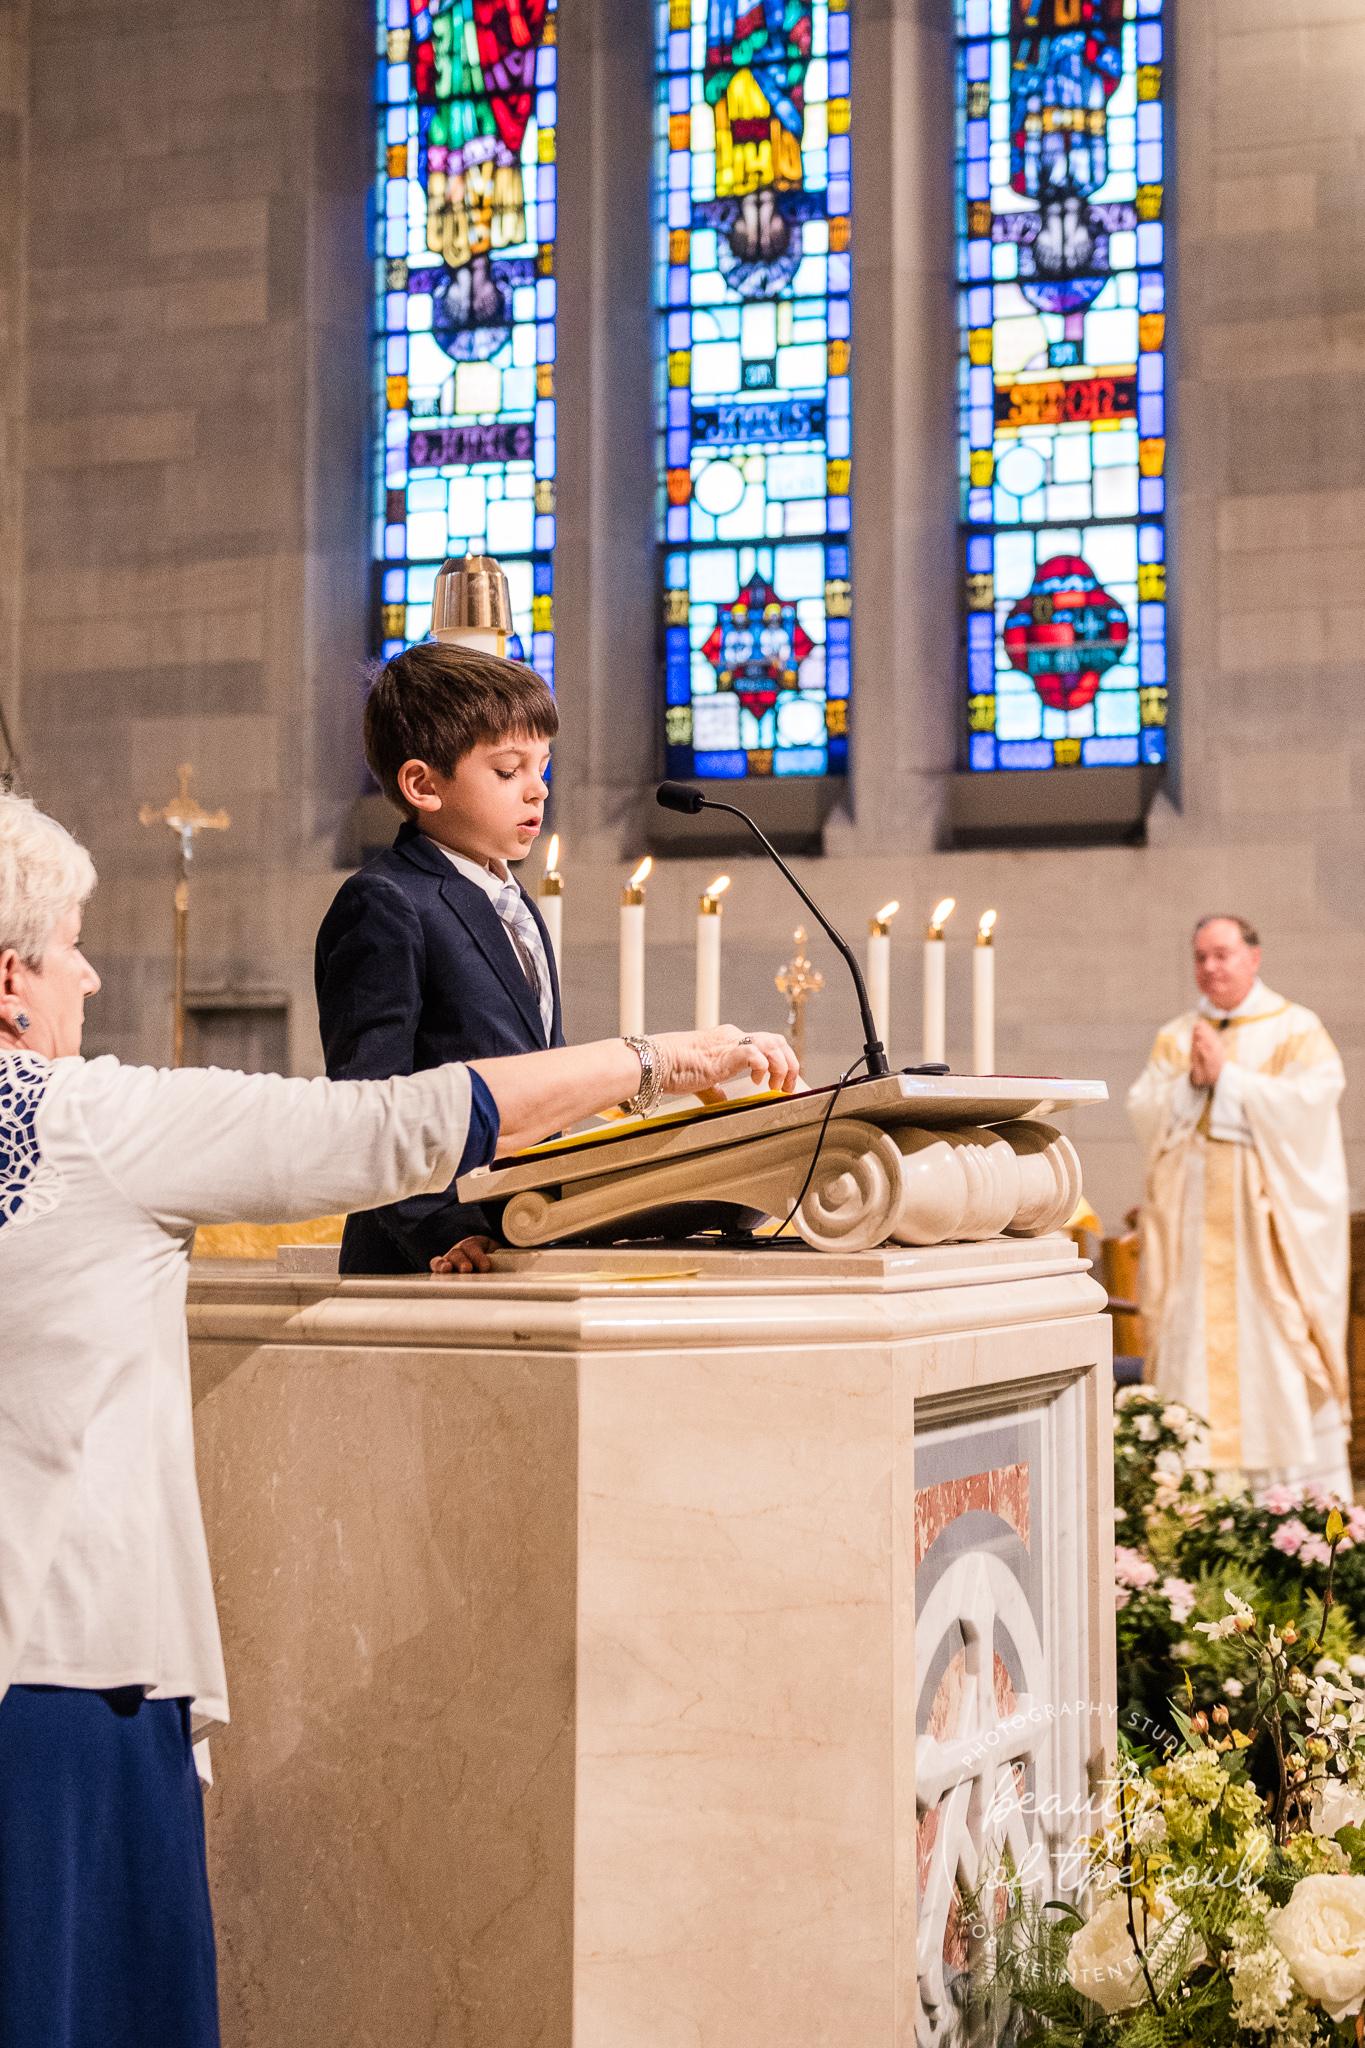 washington-dc-st-ann-catholic-church-first-holy-communion-beauty-of-the-soul-studio-may-2019-09.jpg